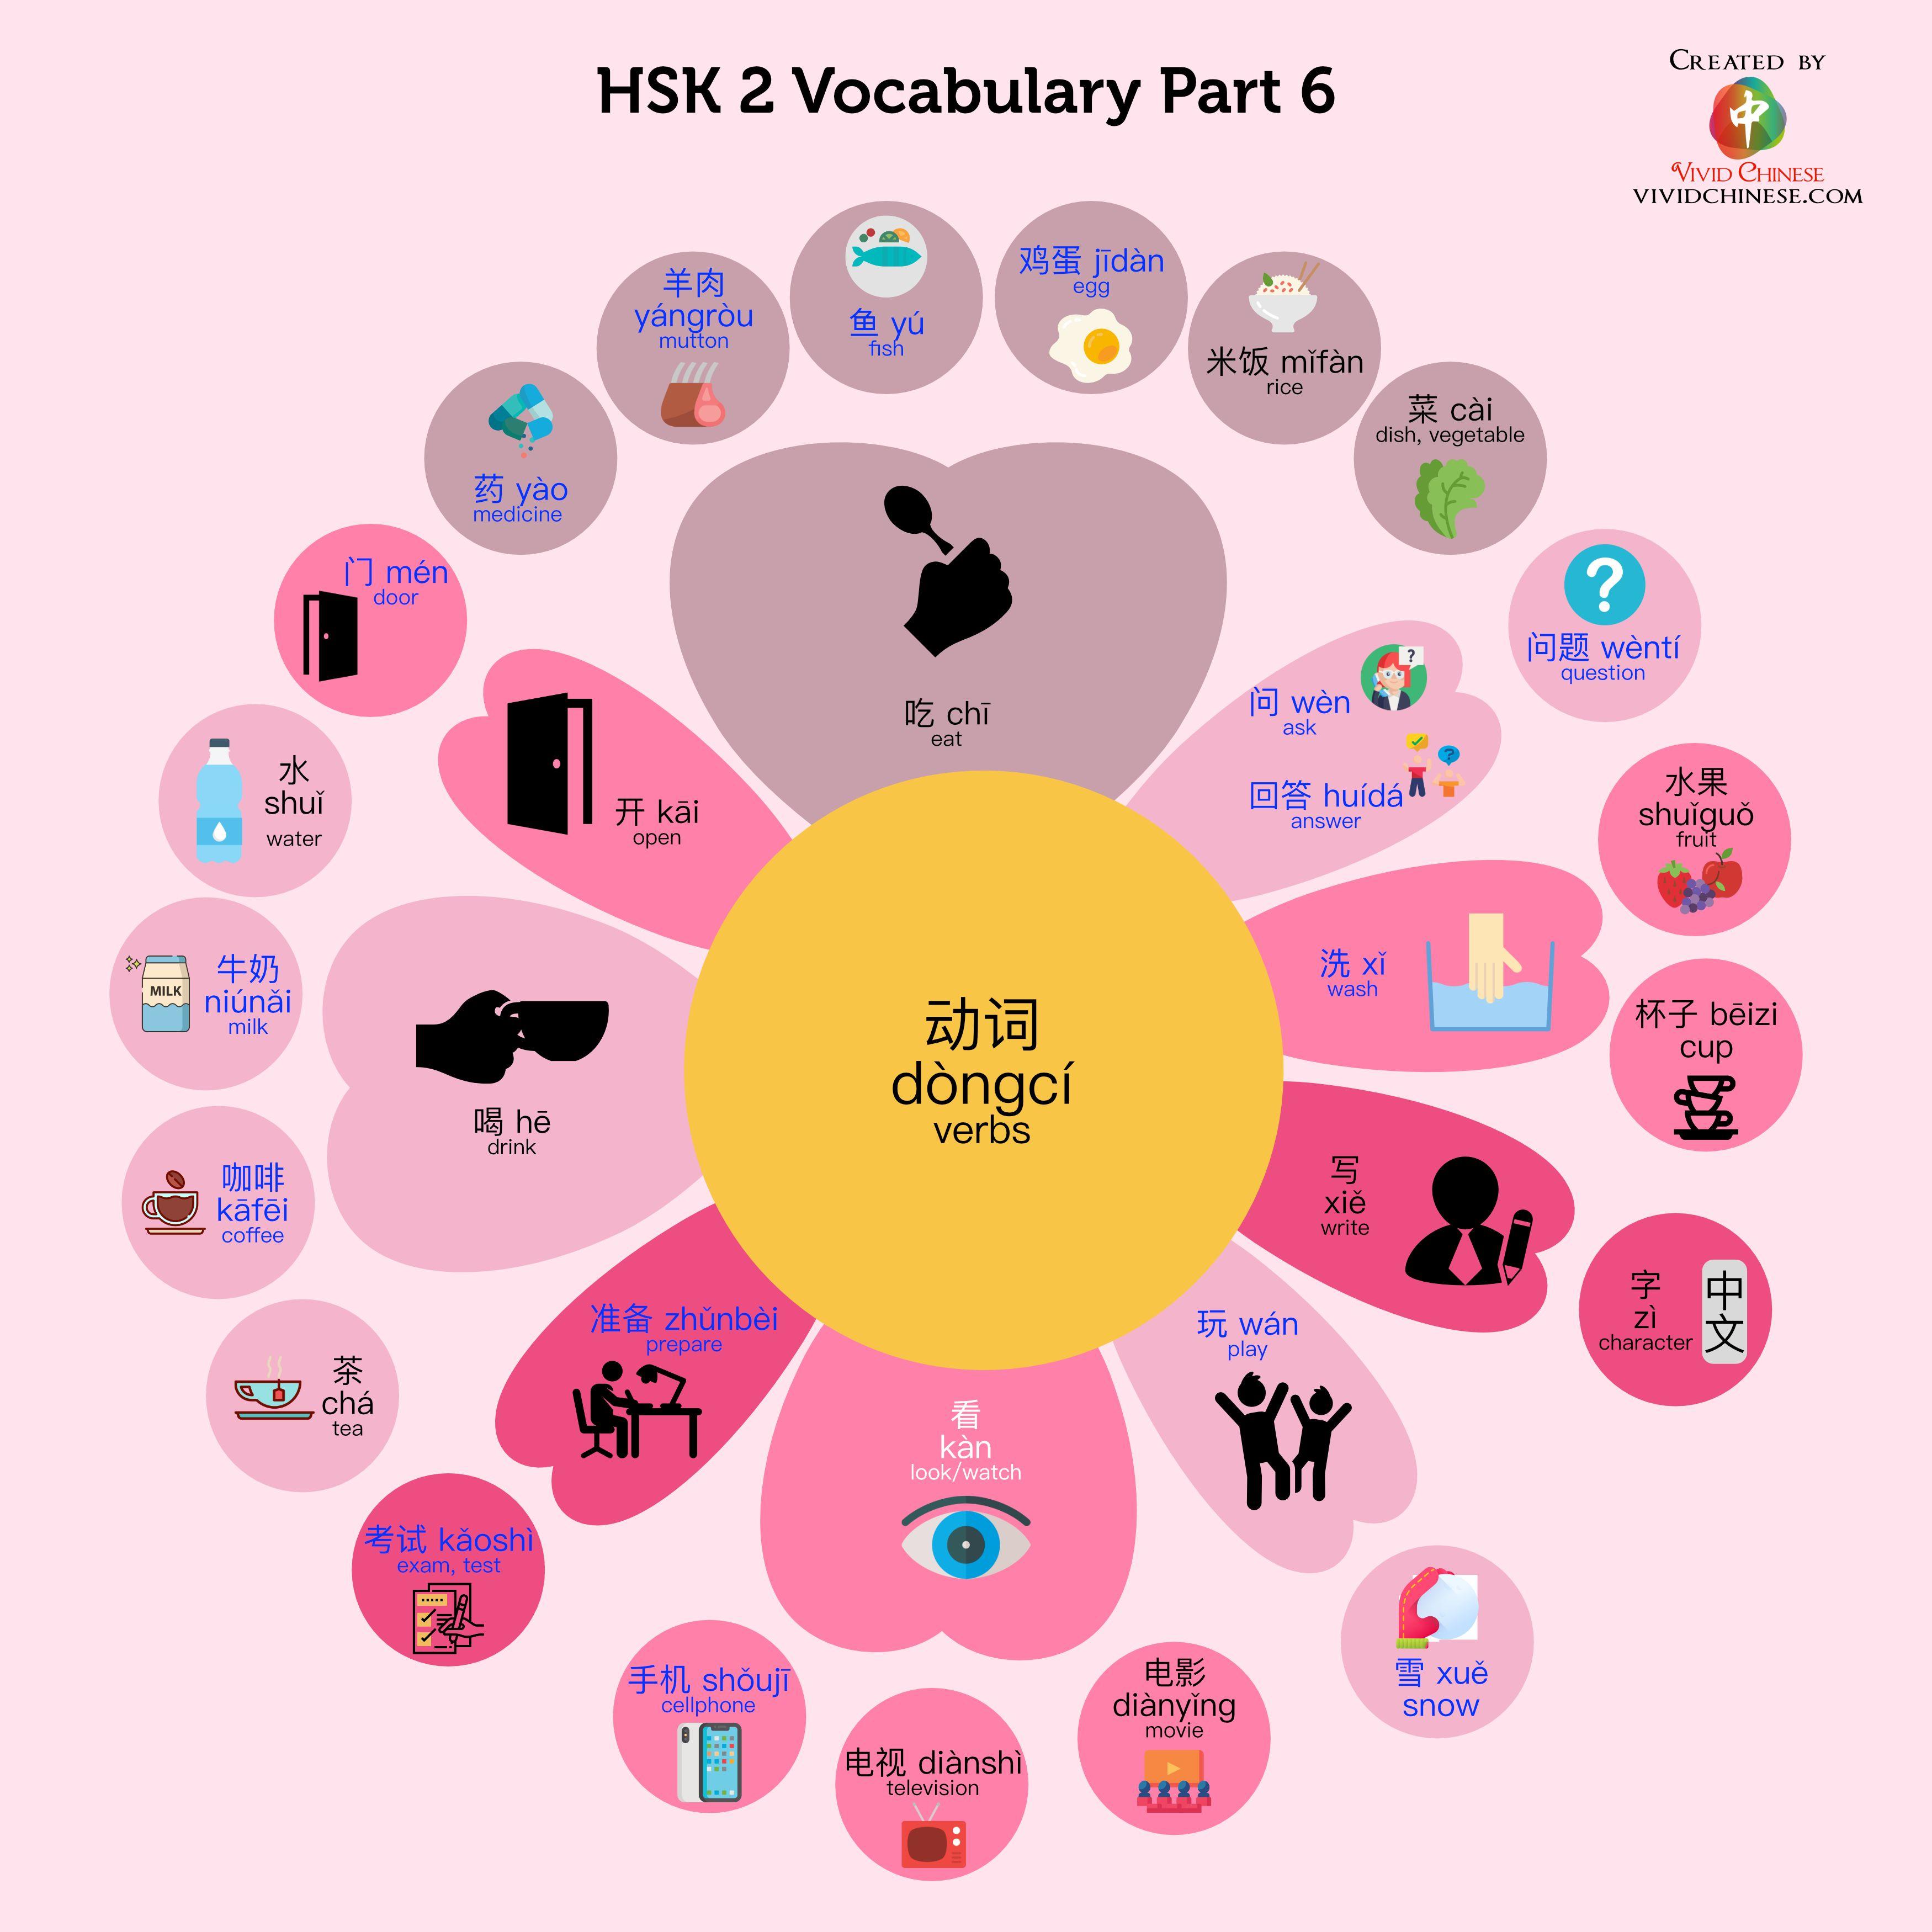 Hsk 2 Vocabulary Part 6